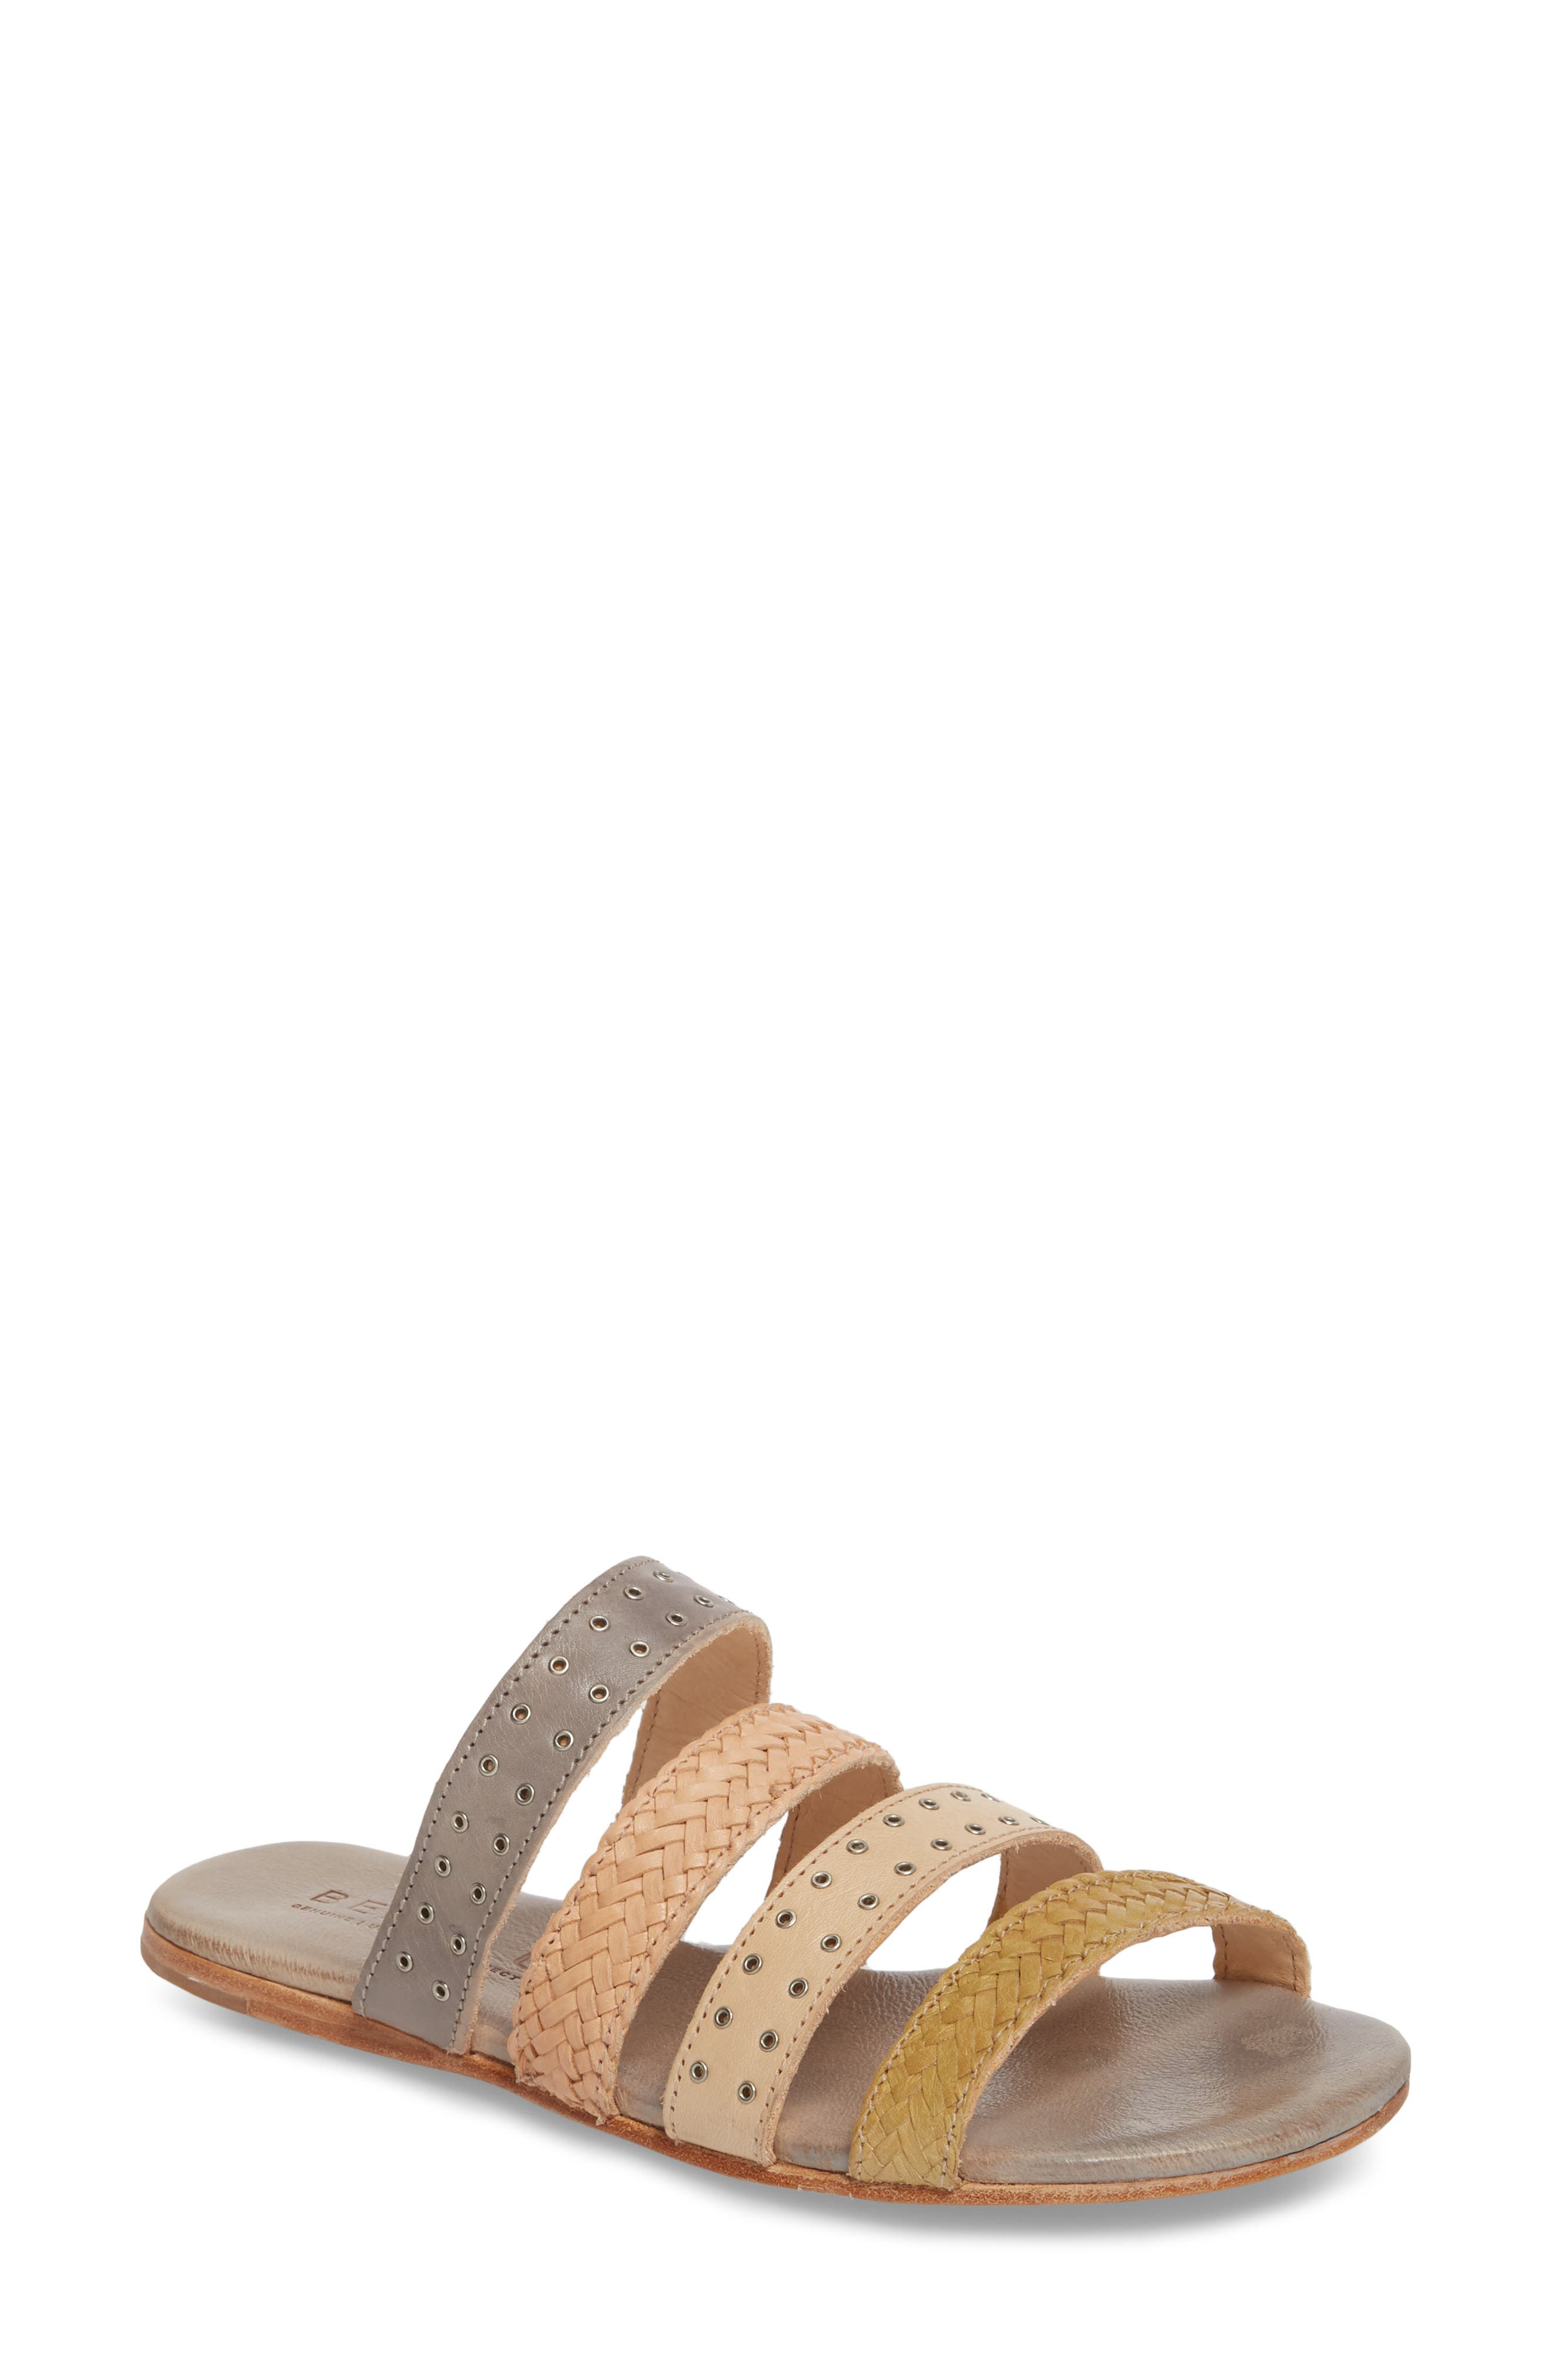 Henna Slide Sandal,                             Main thumbnail 1, color,                             CASHEW/ LIGHT GREY LEATHER